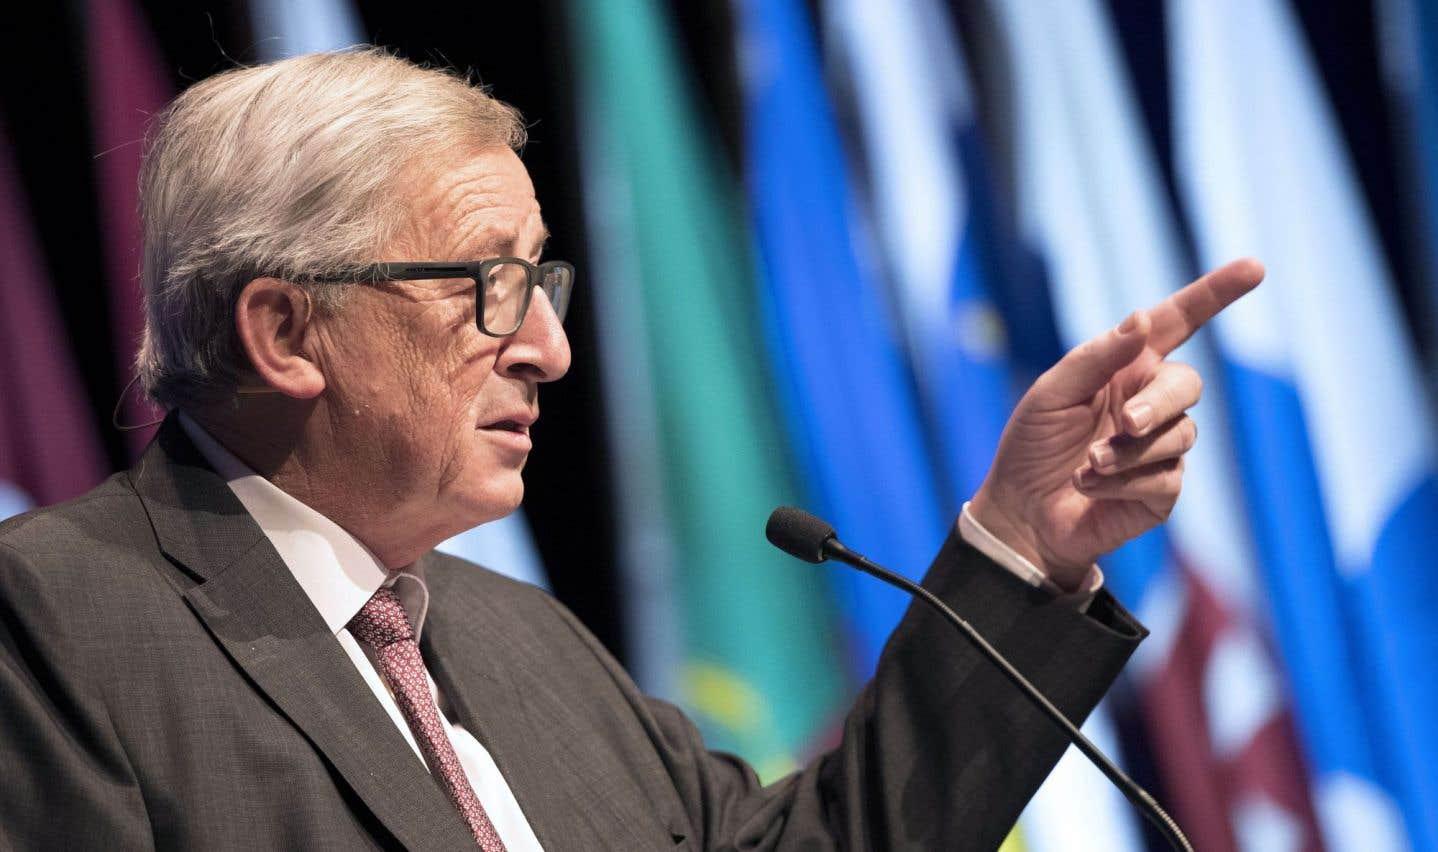 25ans après Maastricht, Juncker met en garde contre l'éclatement